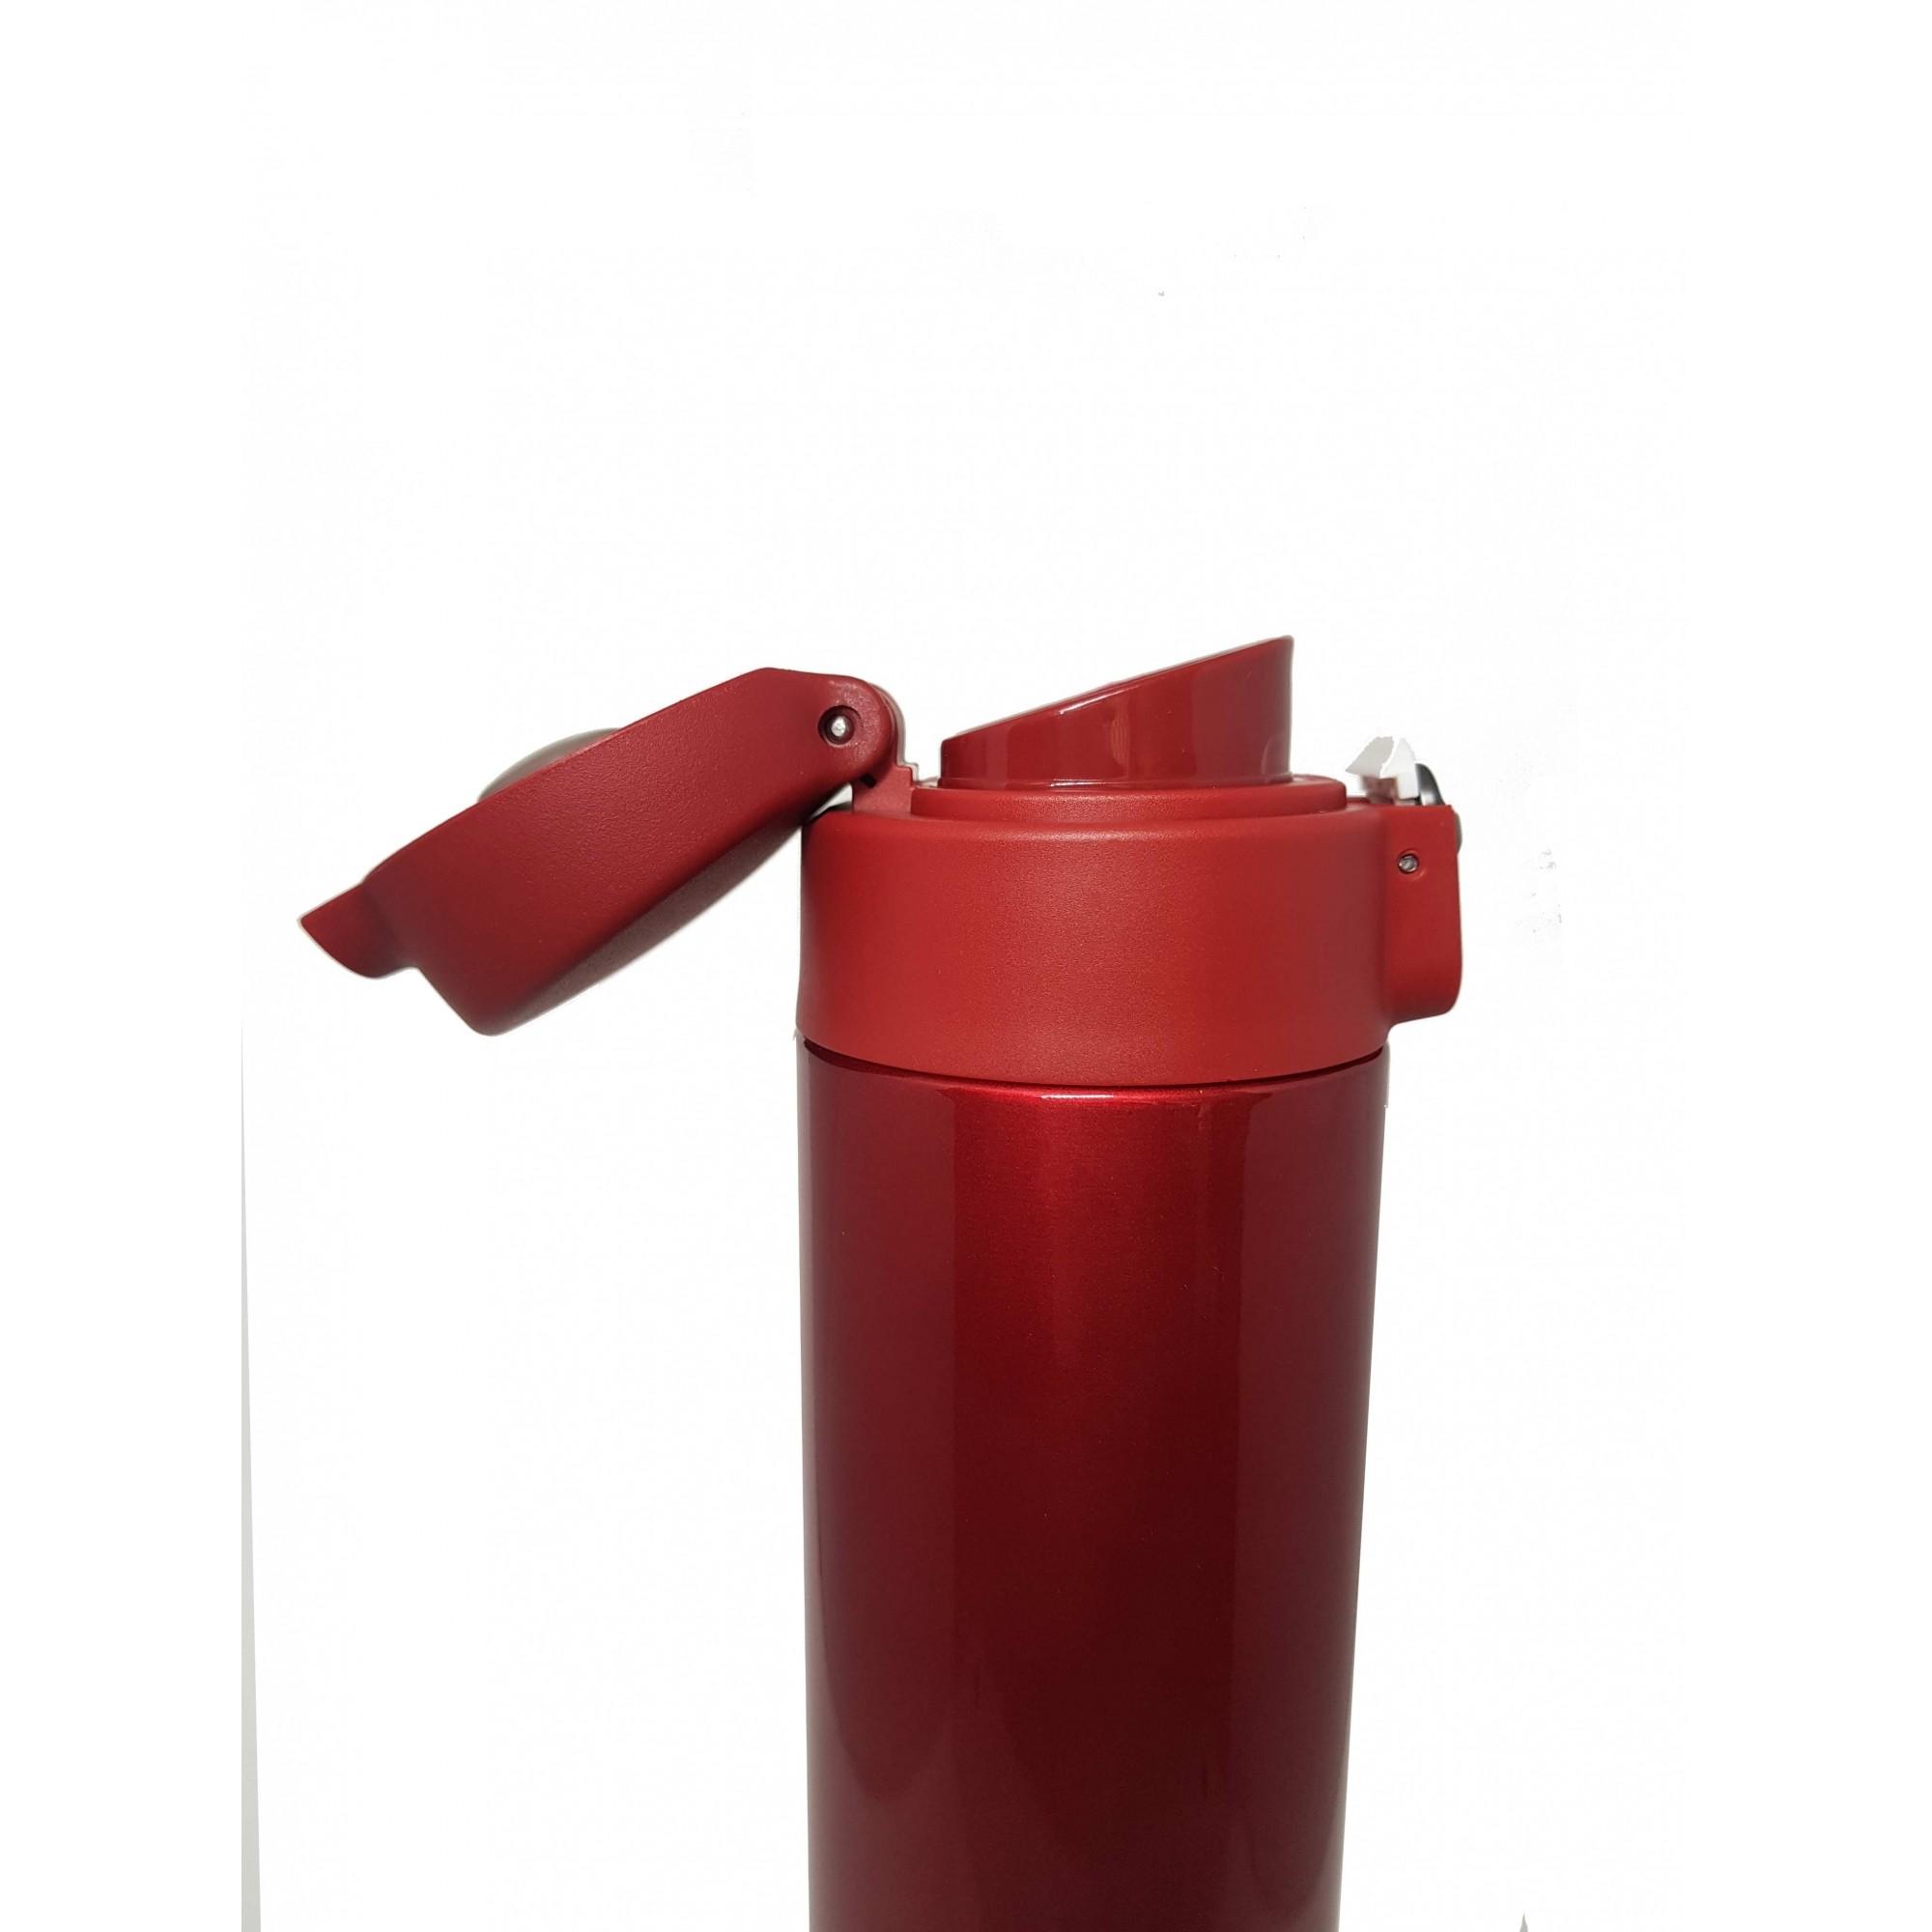 Kit Mundo Mochila + garrafa inox 500 ml Vermelha+ kit 6 em 1 Azul